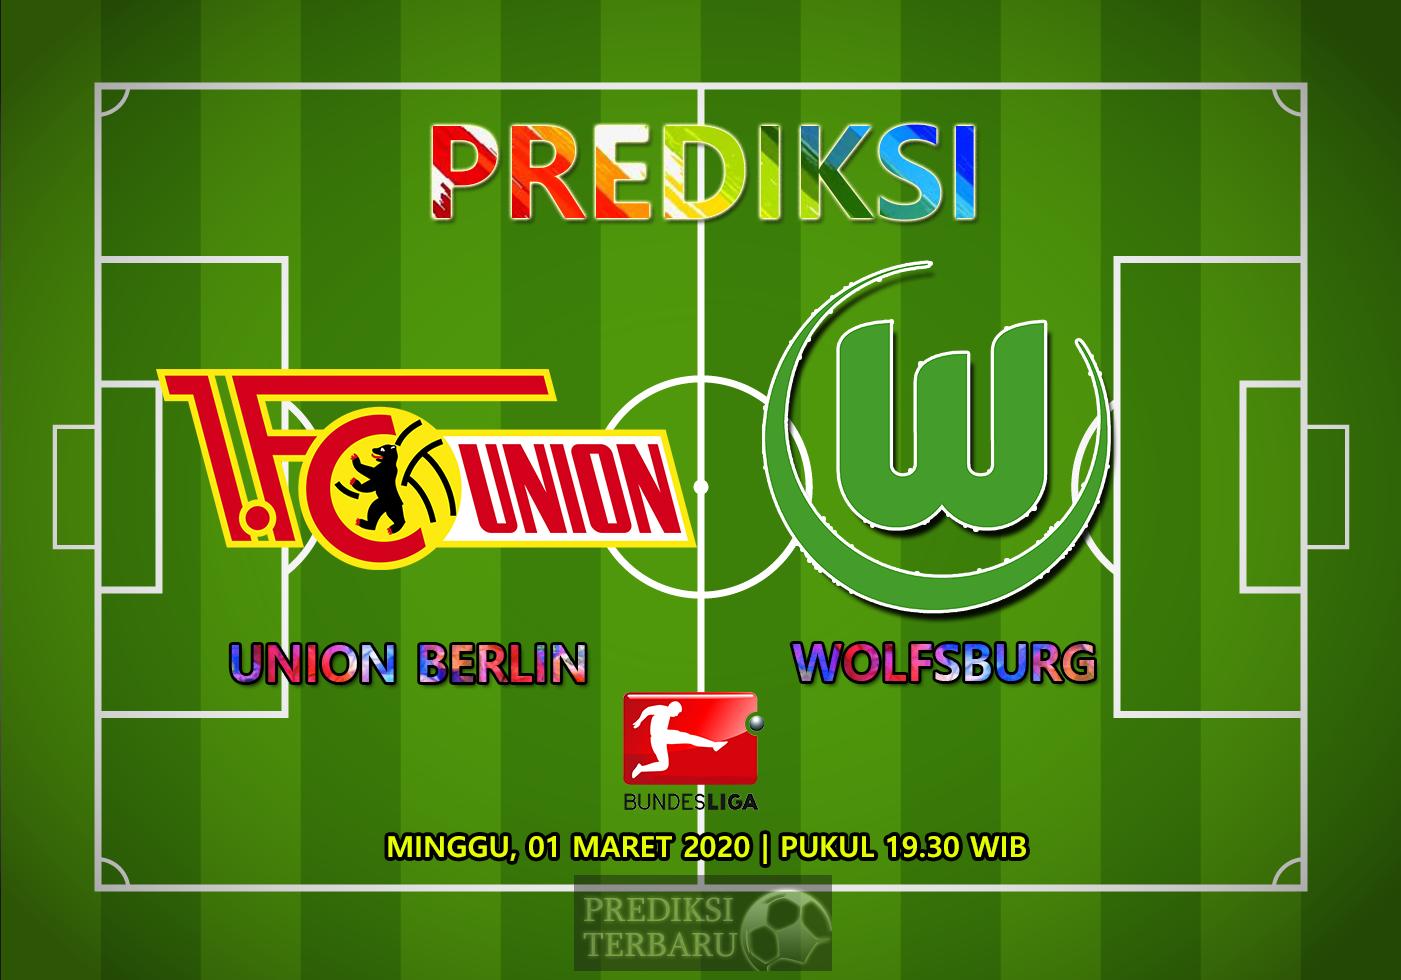 Prediksi Union Berlin Vs Wolfsburg Minggu 01 Maret